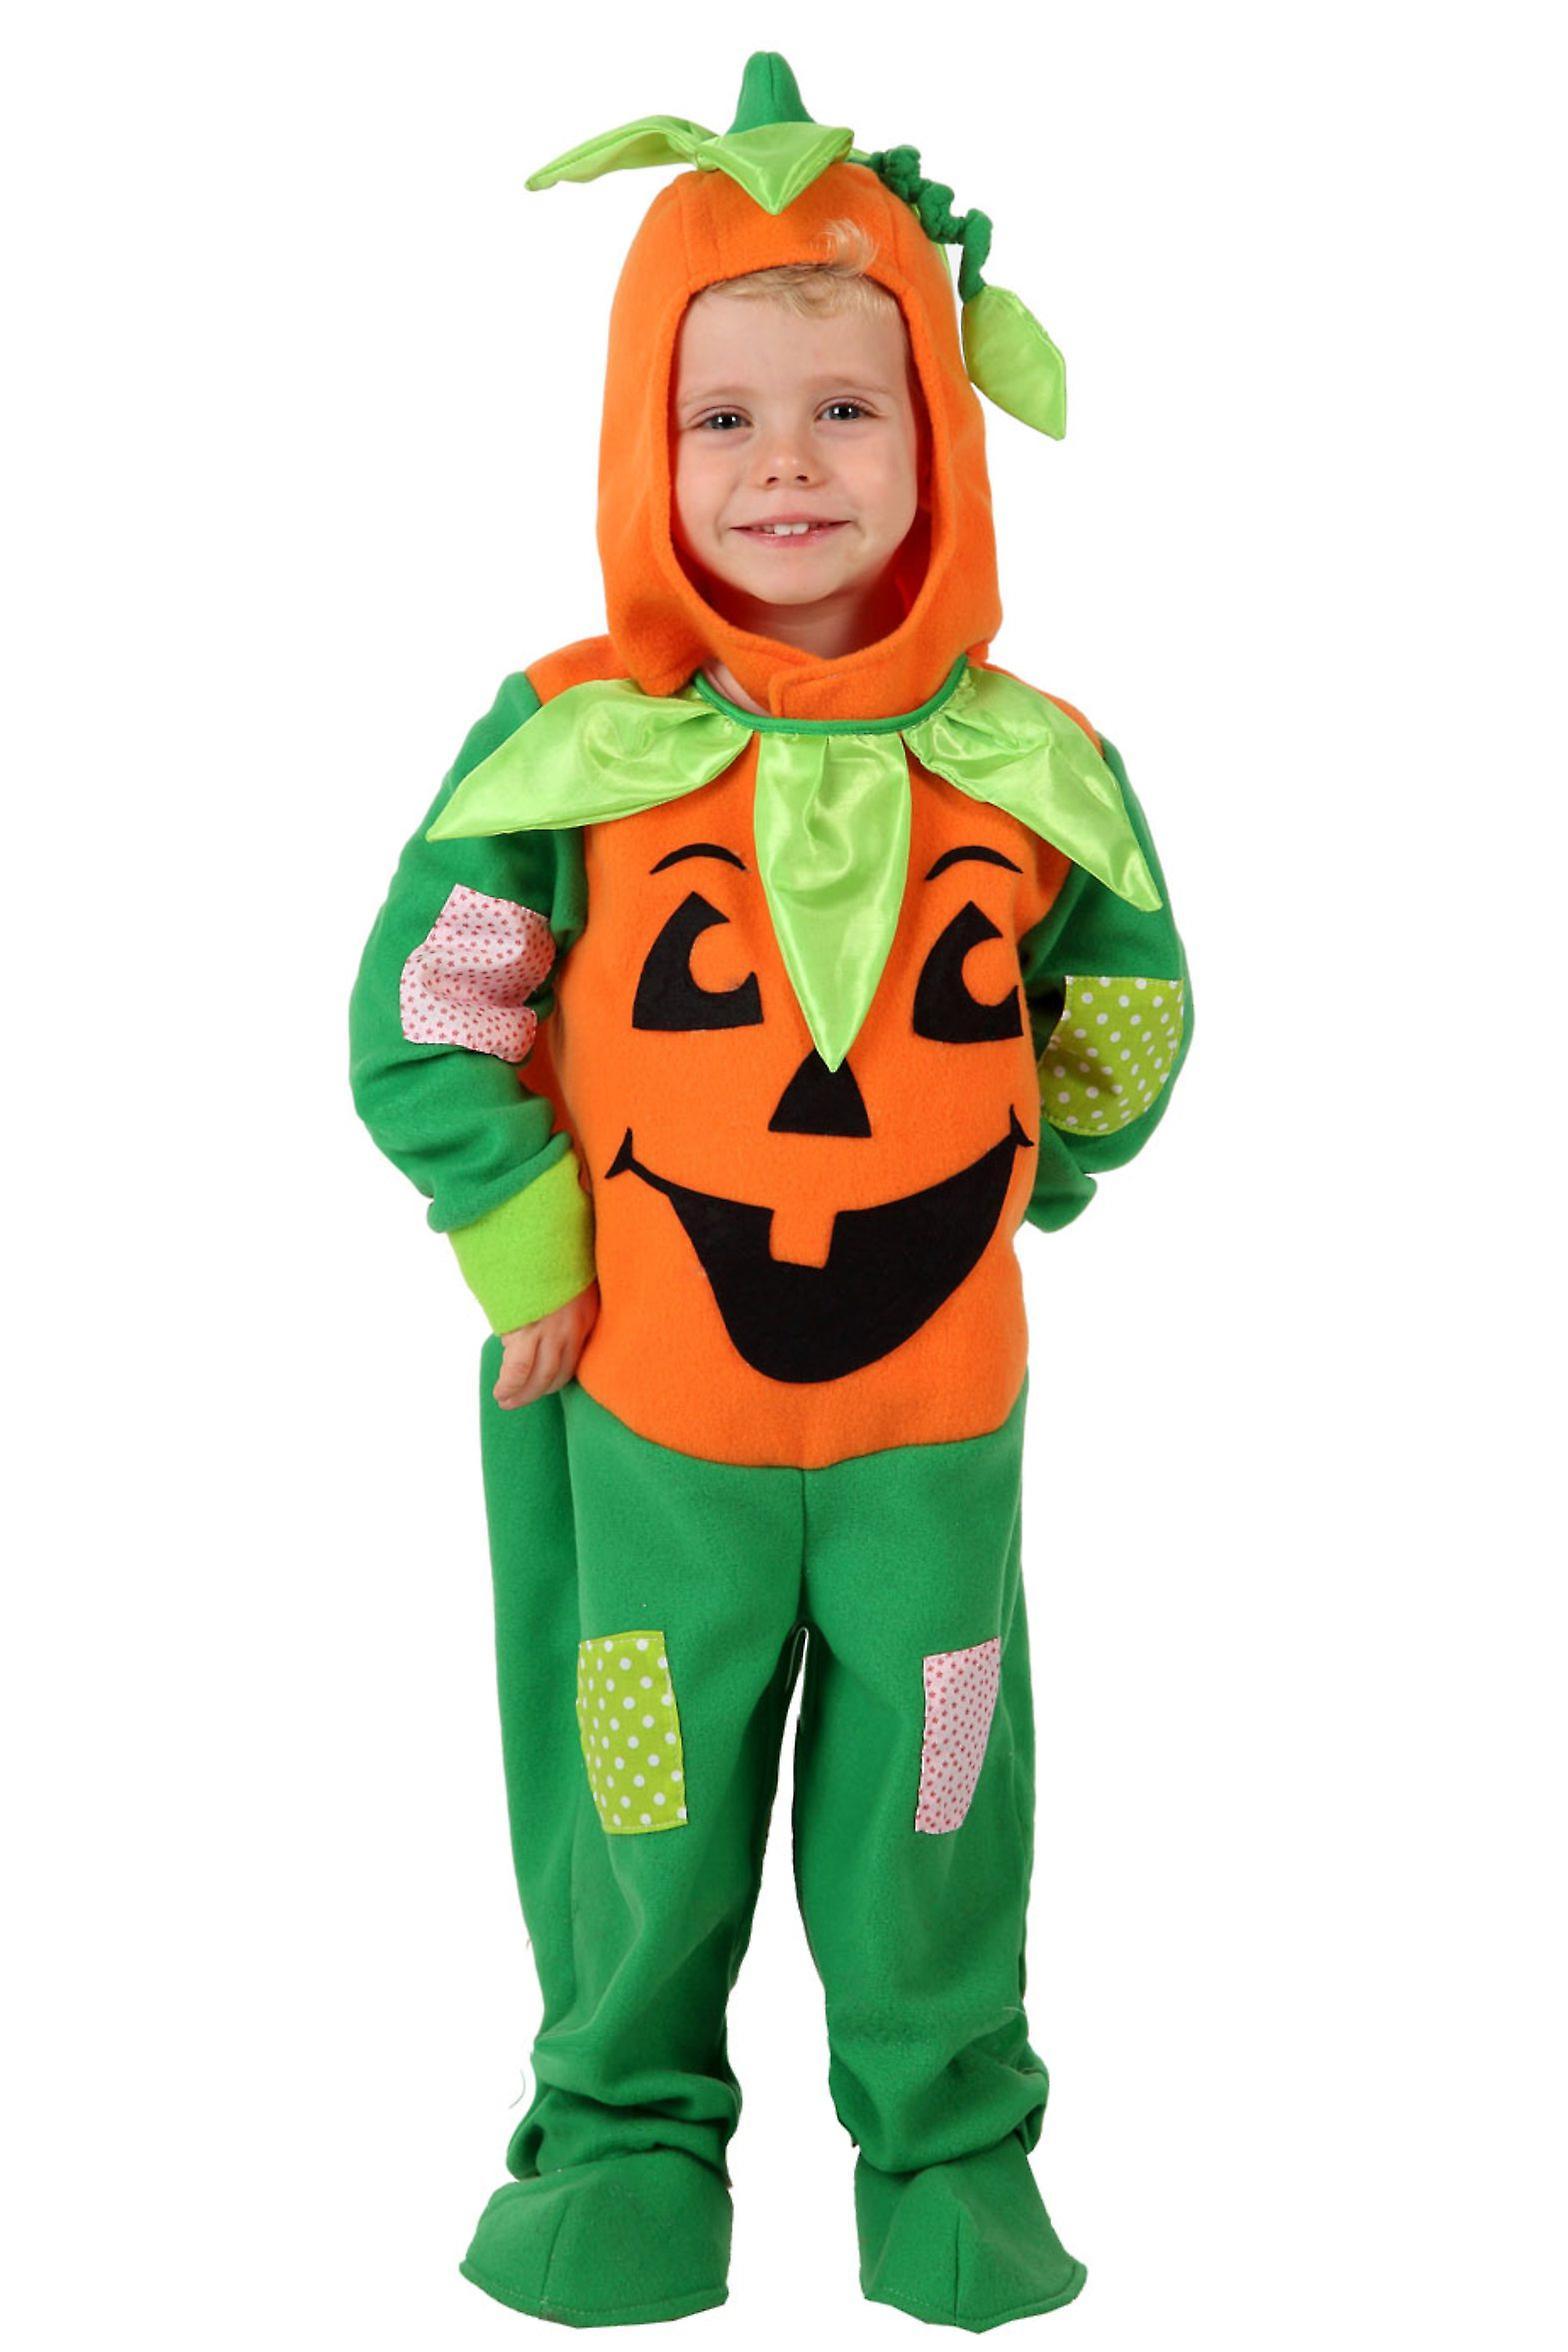 Barn kostymer barn Pumpkin drakt  f17035bdfd90b